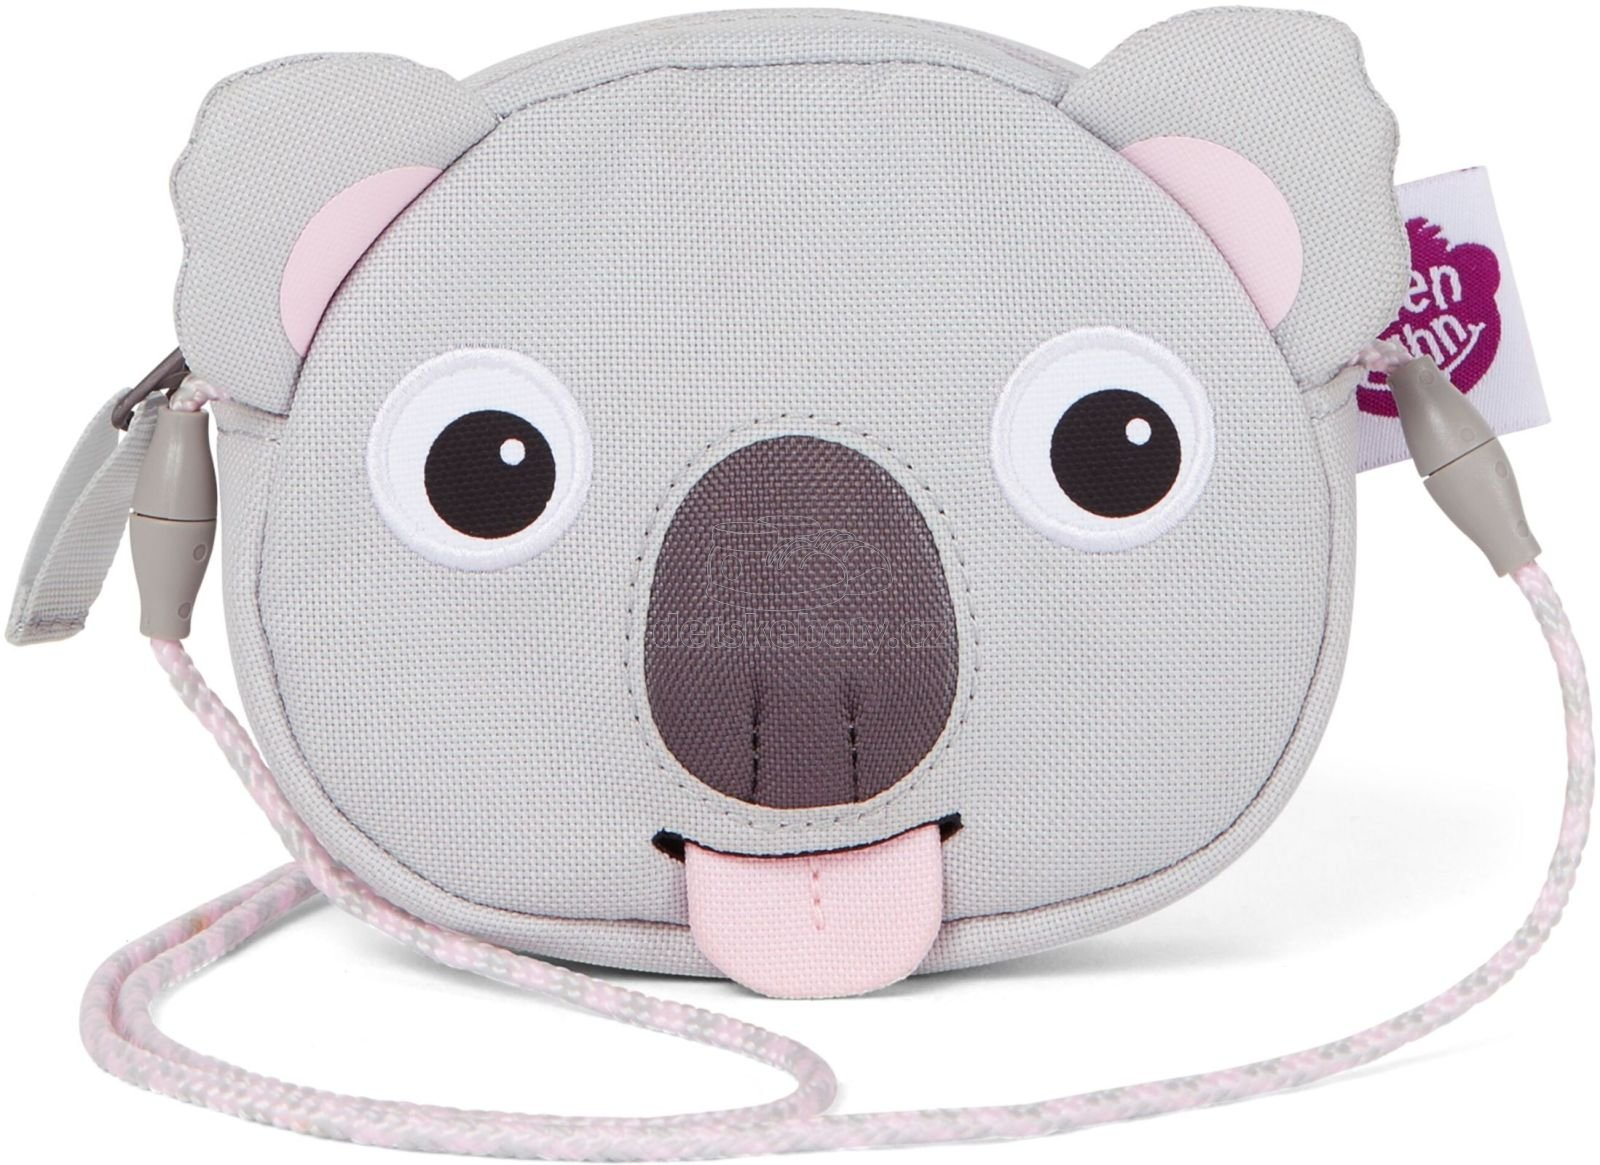 Dětská kabelka Affenzahn Wallet - Koala Karla - grey